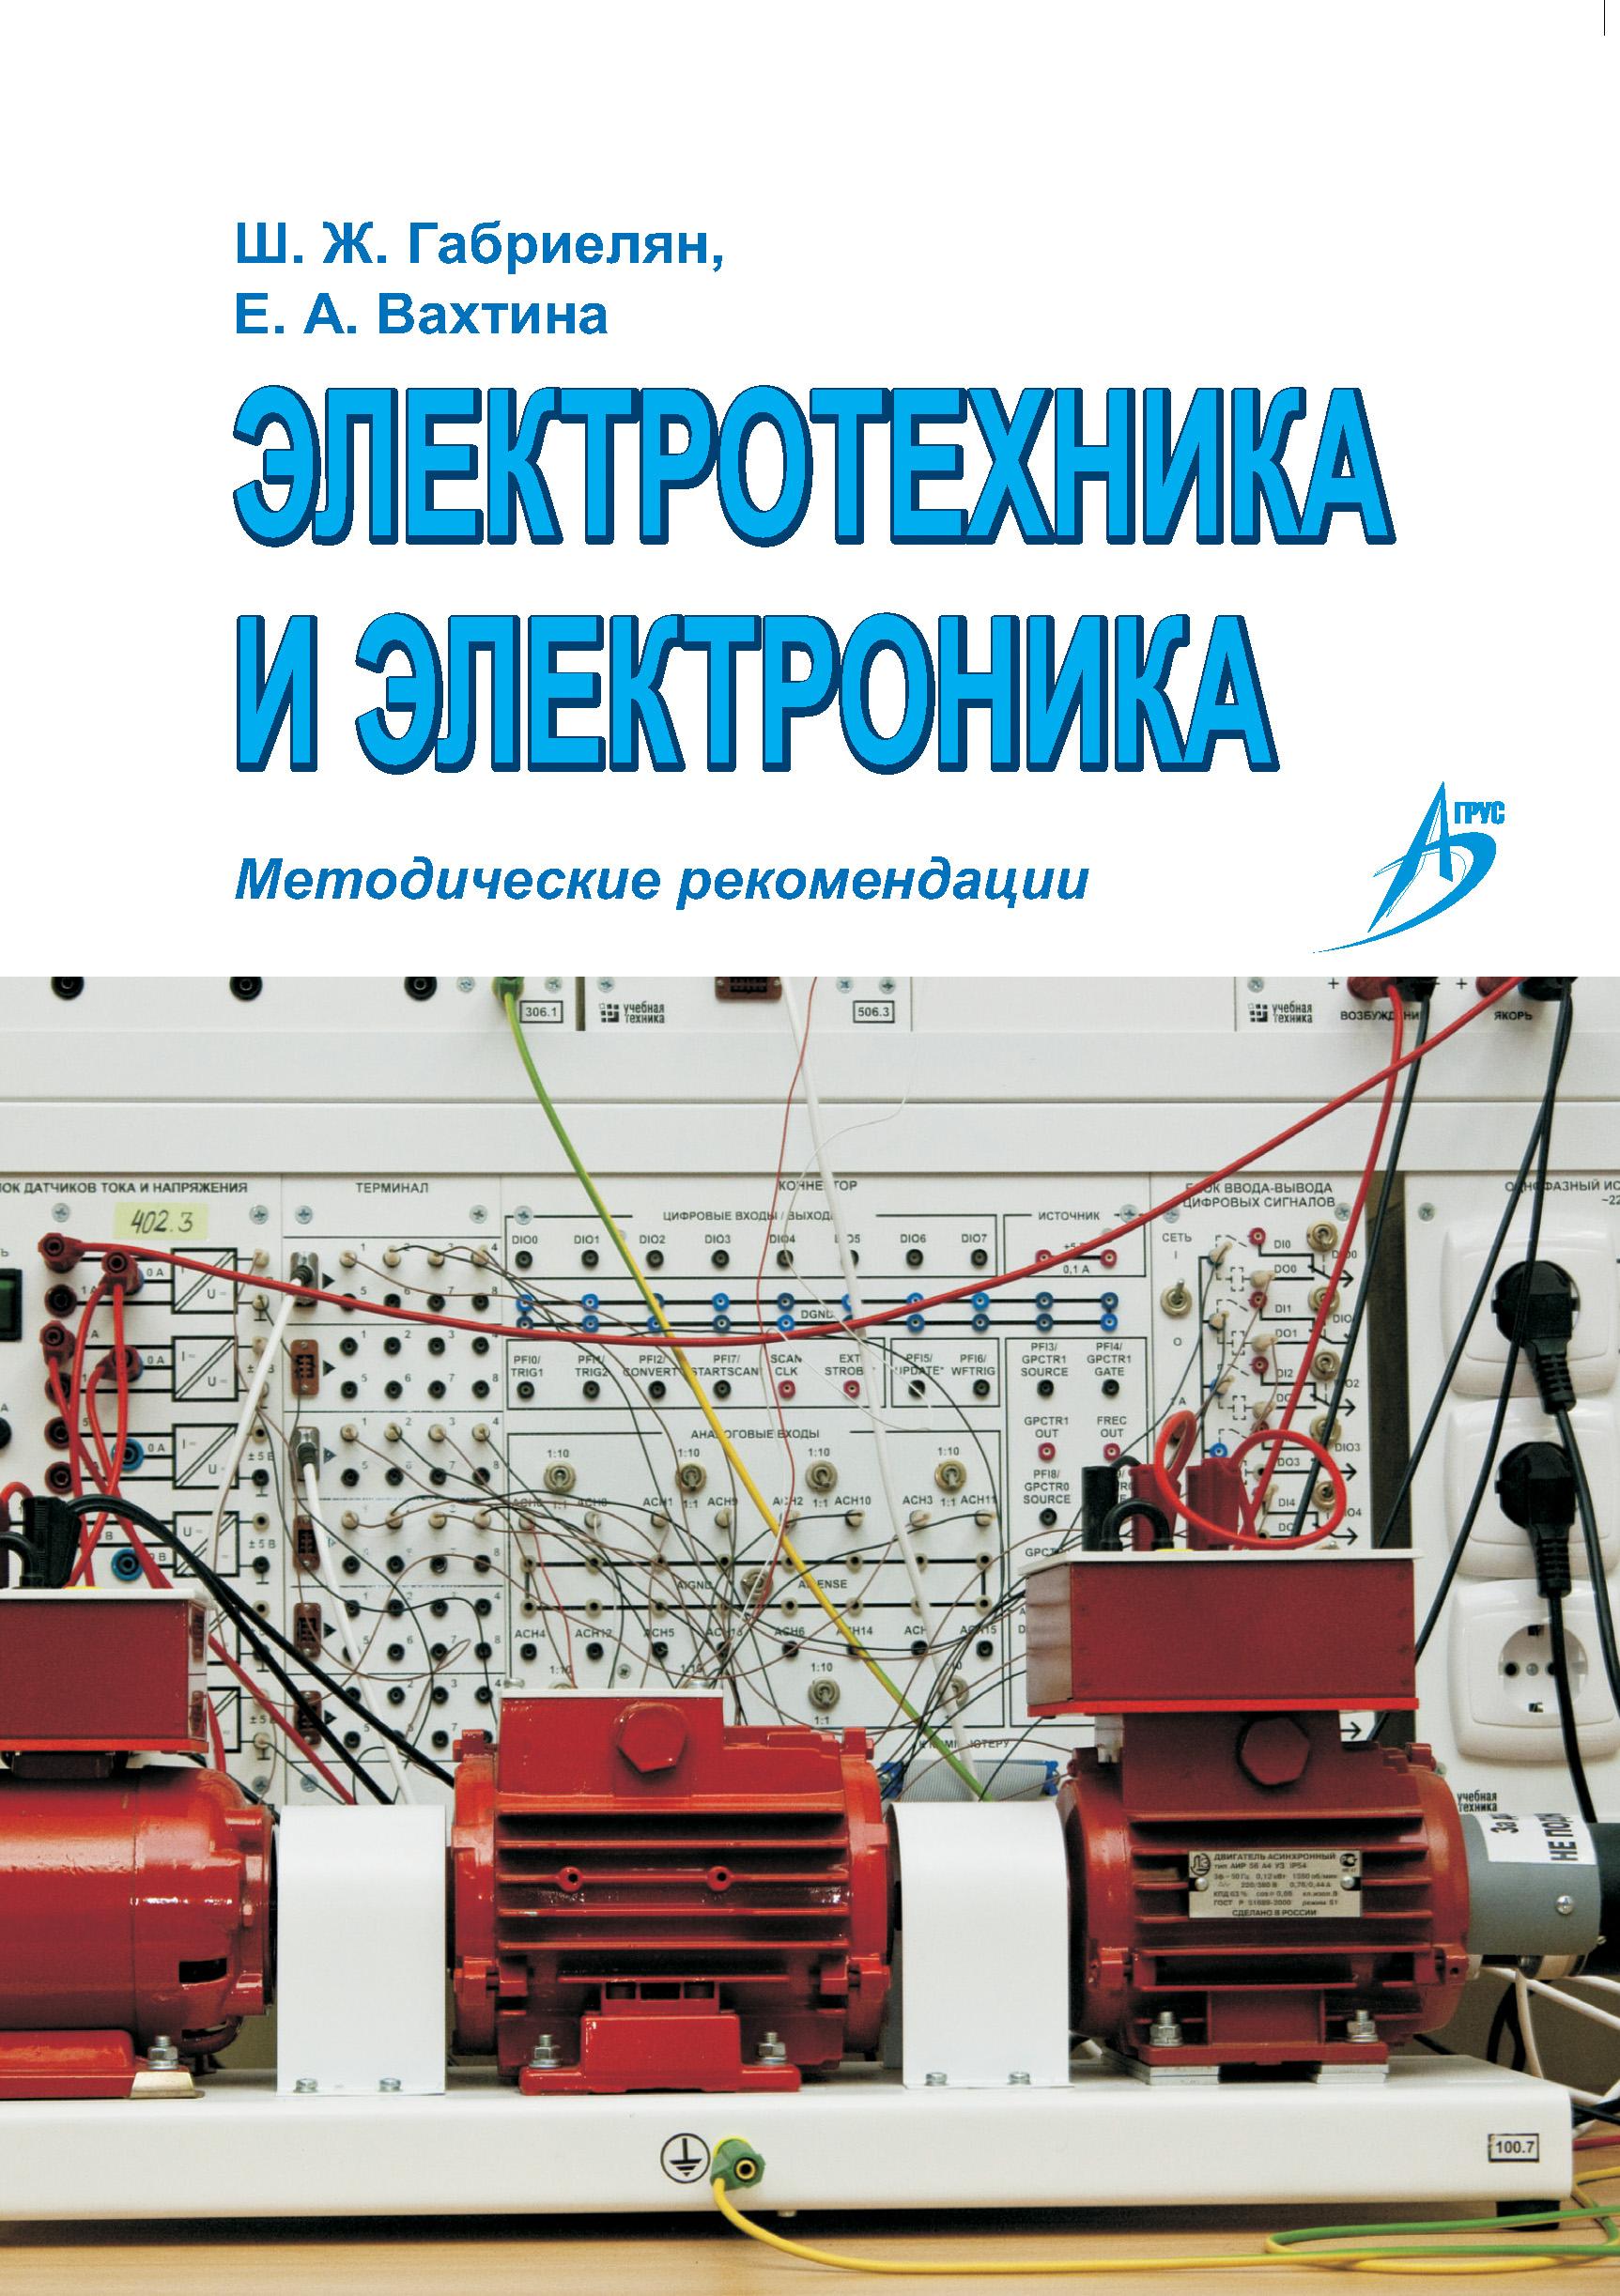 цены Ш. Ж. Габриелян Электротехника и электроника. Методические рекомендации